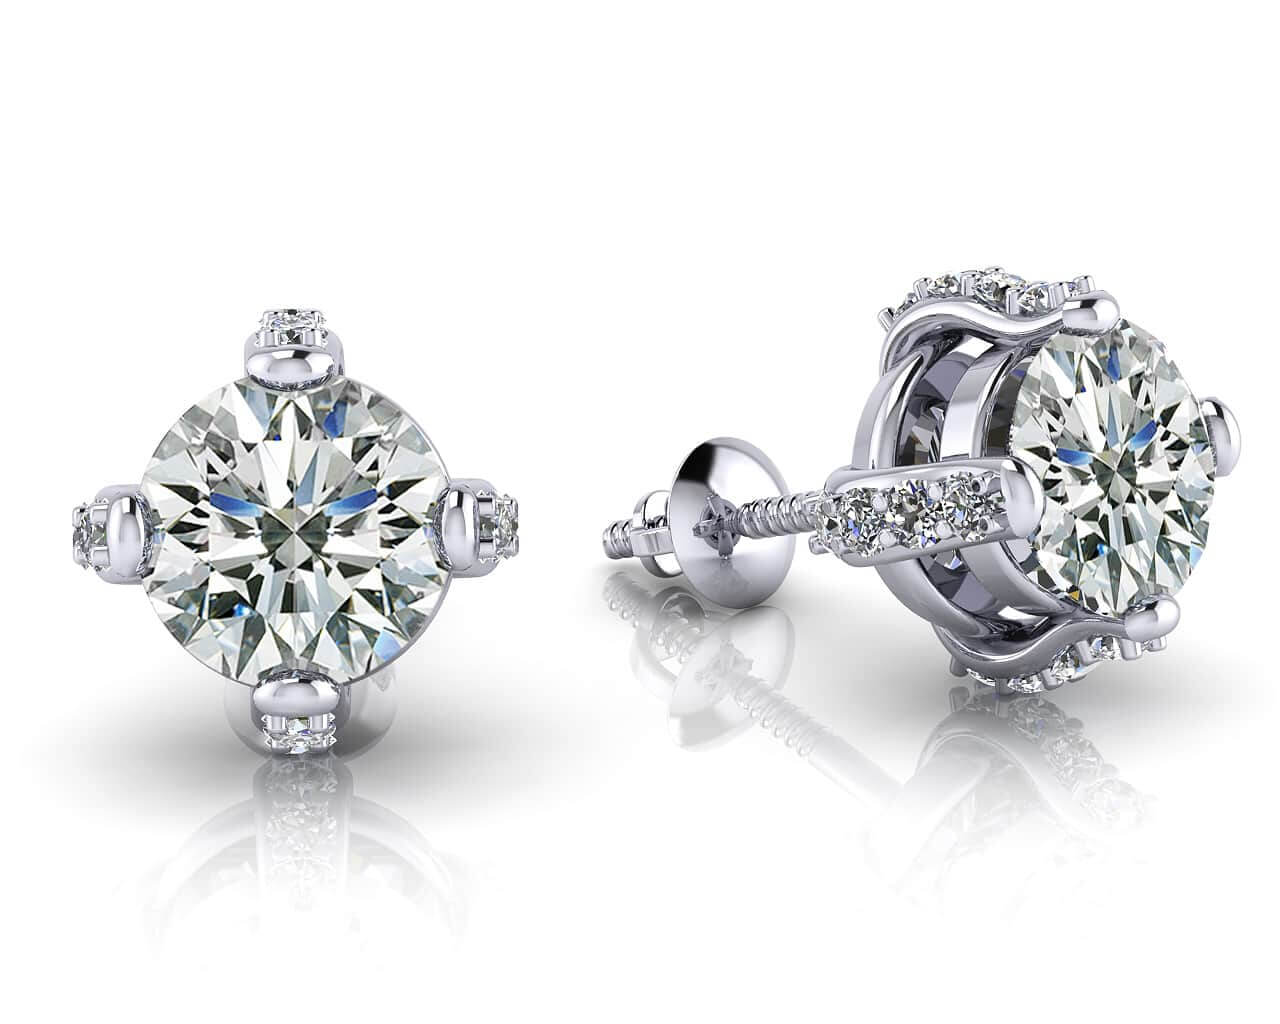 Diamond Stud Earrings: Royal Four Prong Diamond Studs